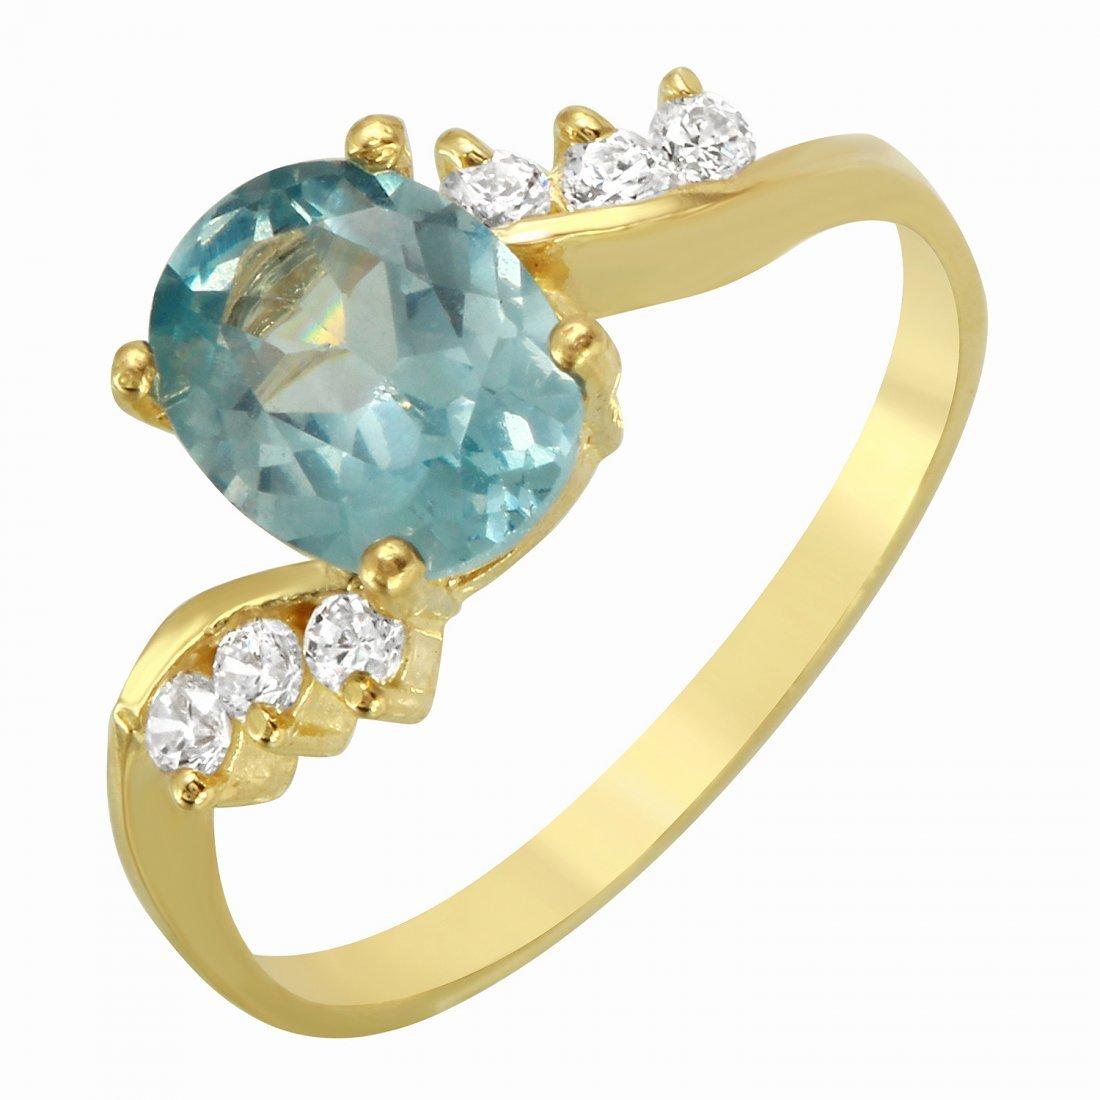 Ladies 14K Yellow Gold Ring With Aquamarine Cubic